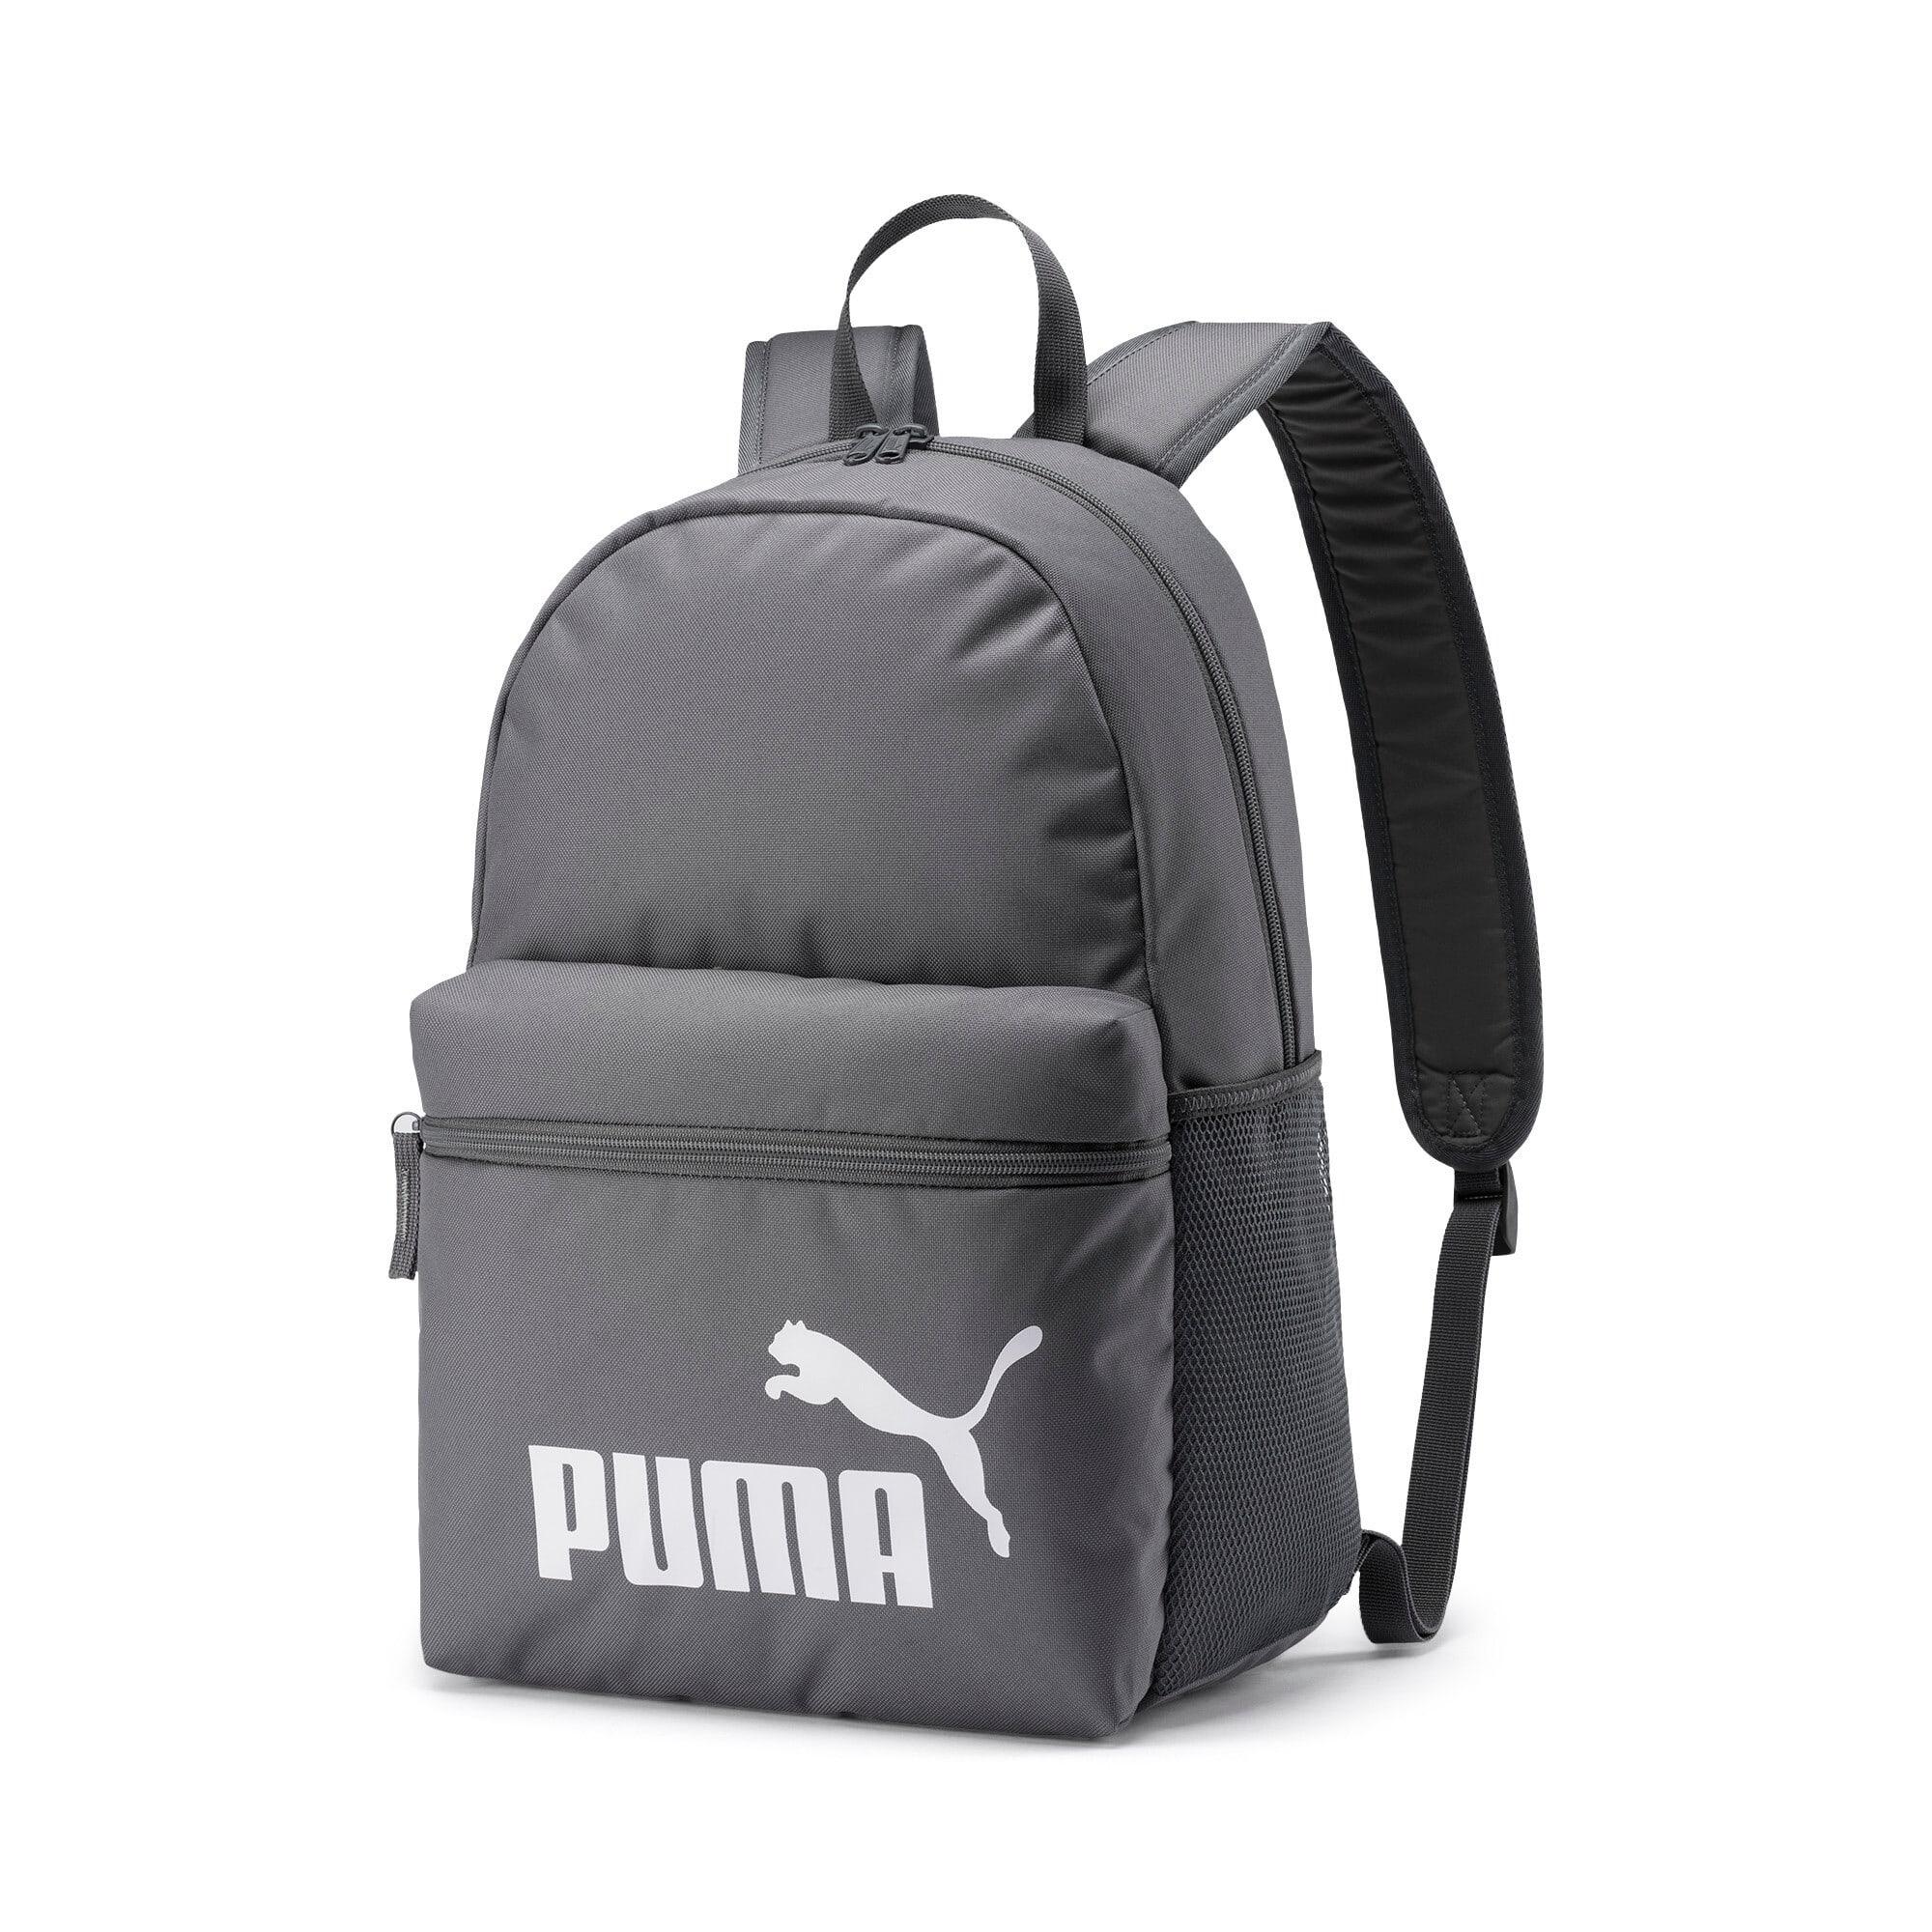 Thumbnail 1 of Phase Backpack, CASTLEROCK, medium